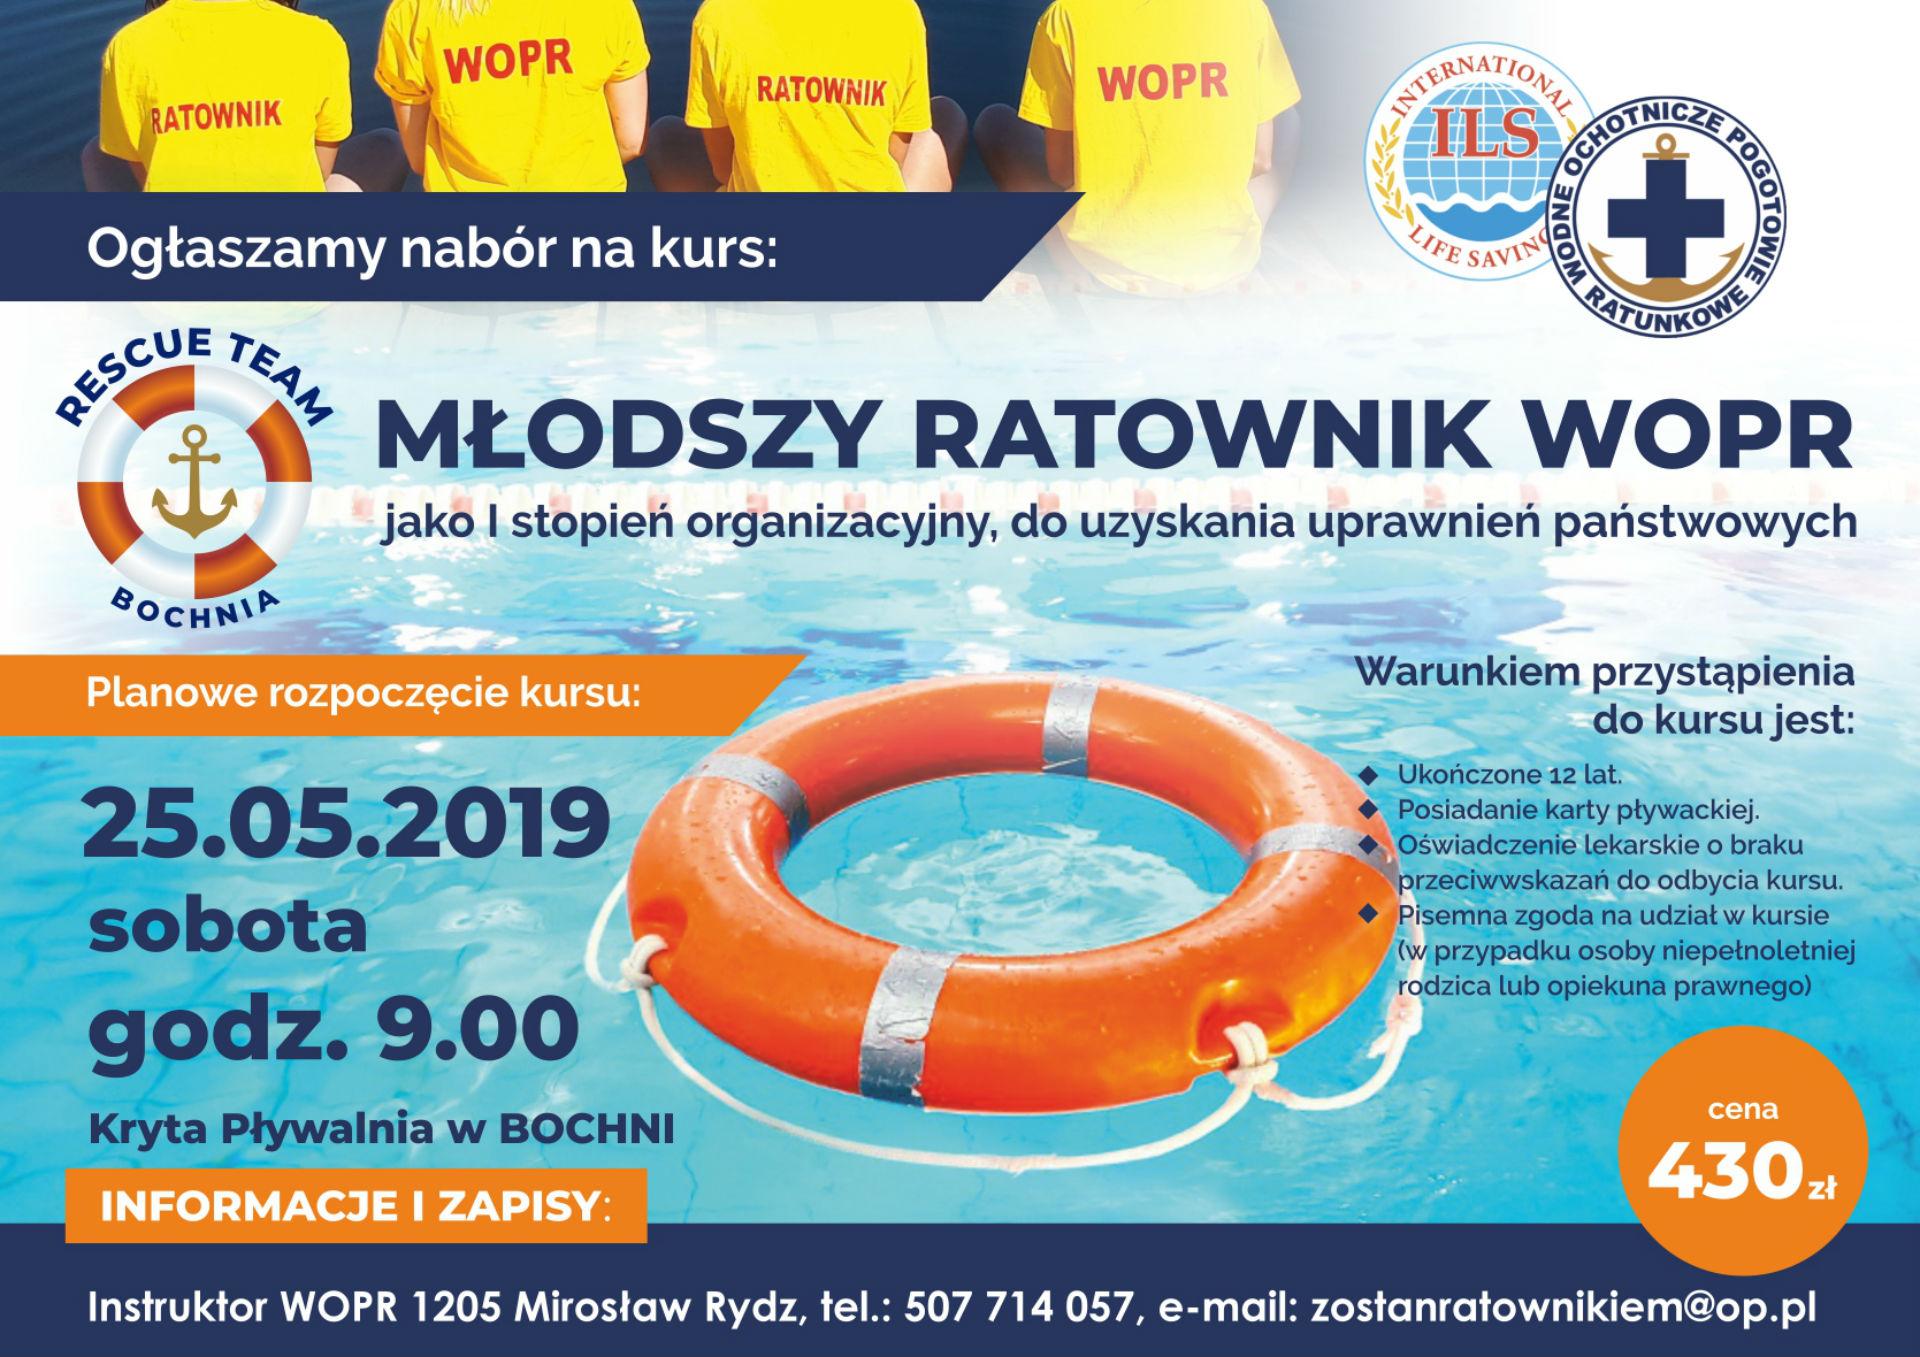 Młodszy ratownik WOPR – kurs już w maju